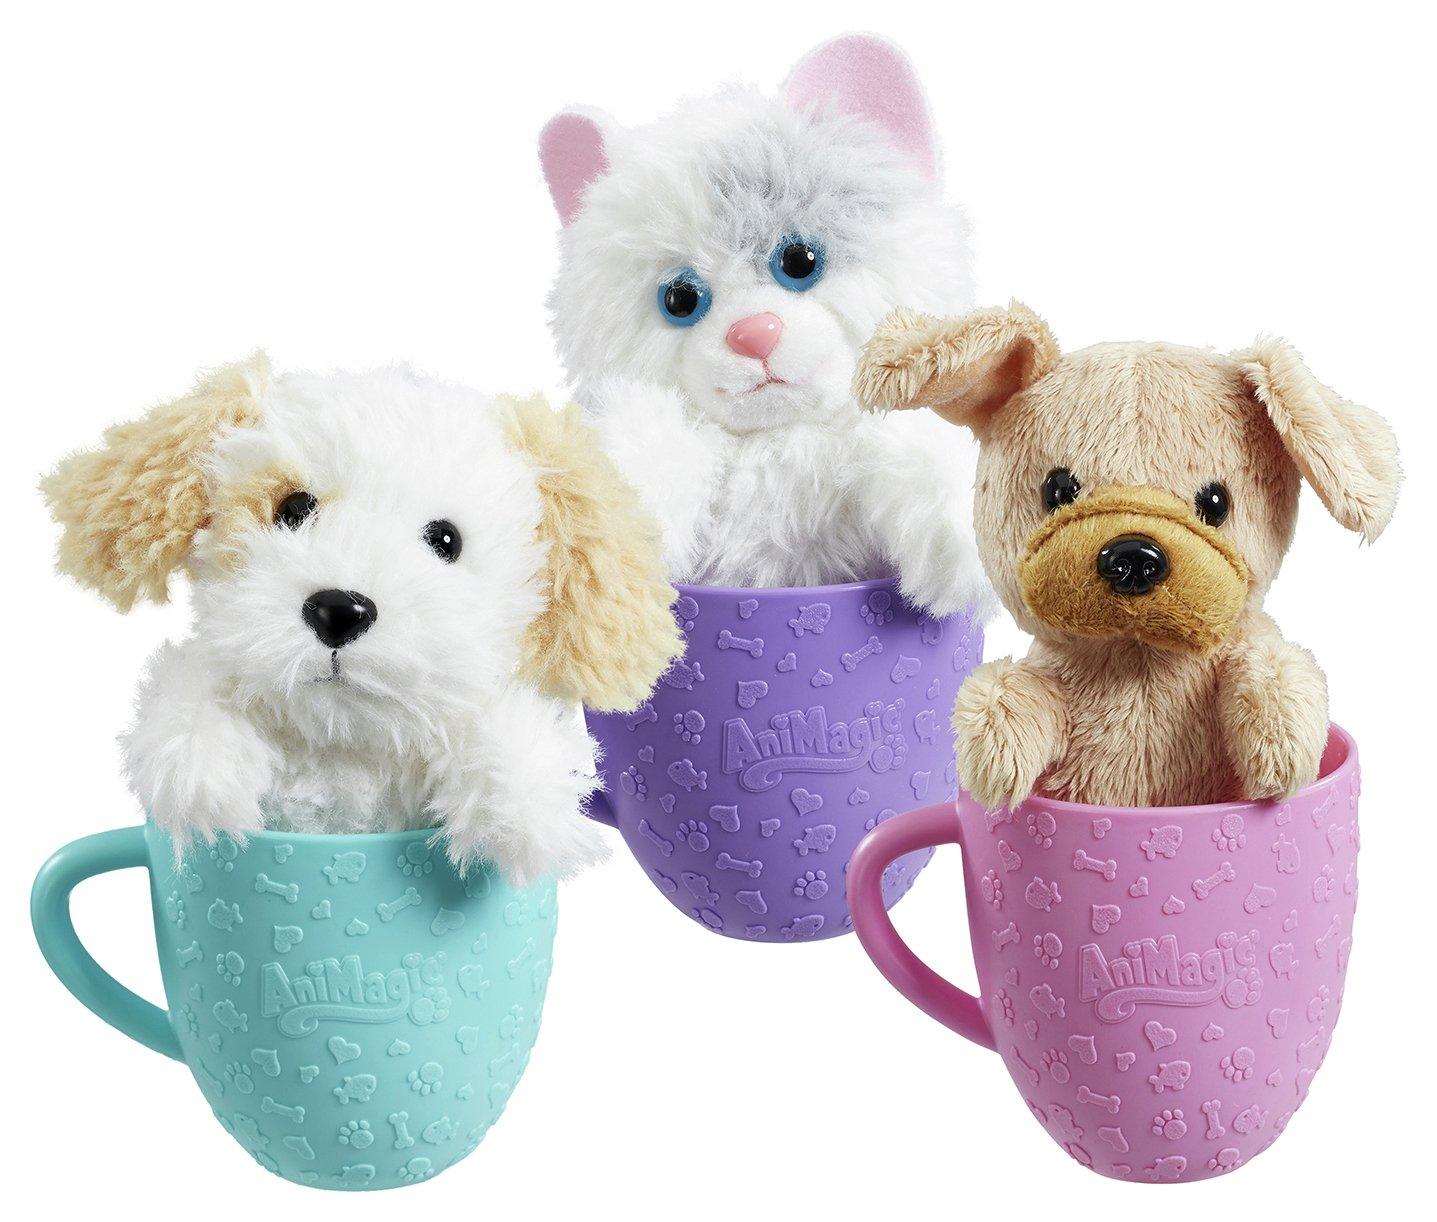 Image of AniMagic Tea Cup Pets